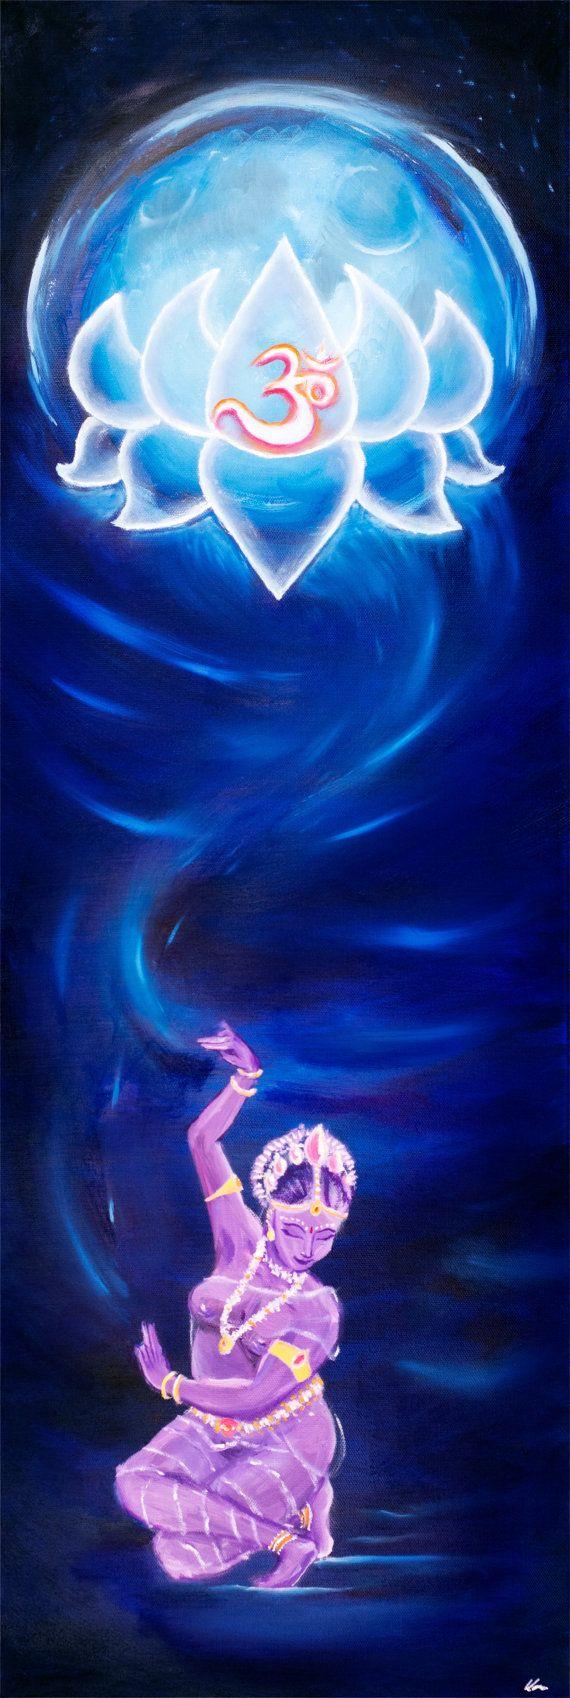 Mira  Lotus Moon Dancer Series by MissSharda on Etsy